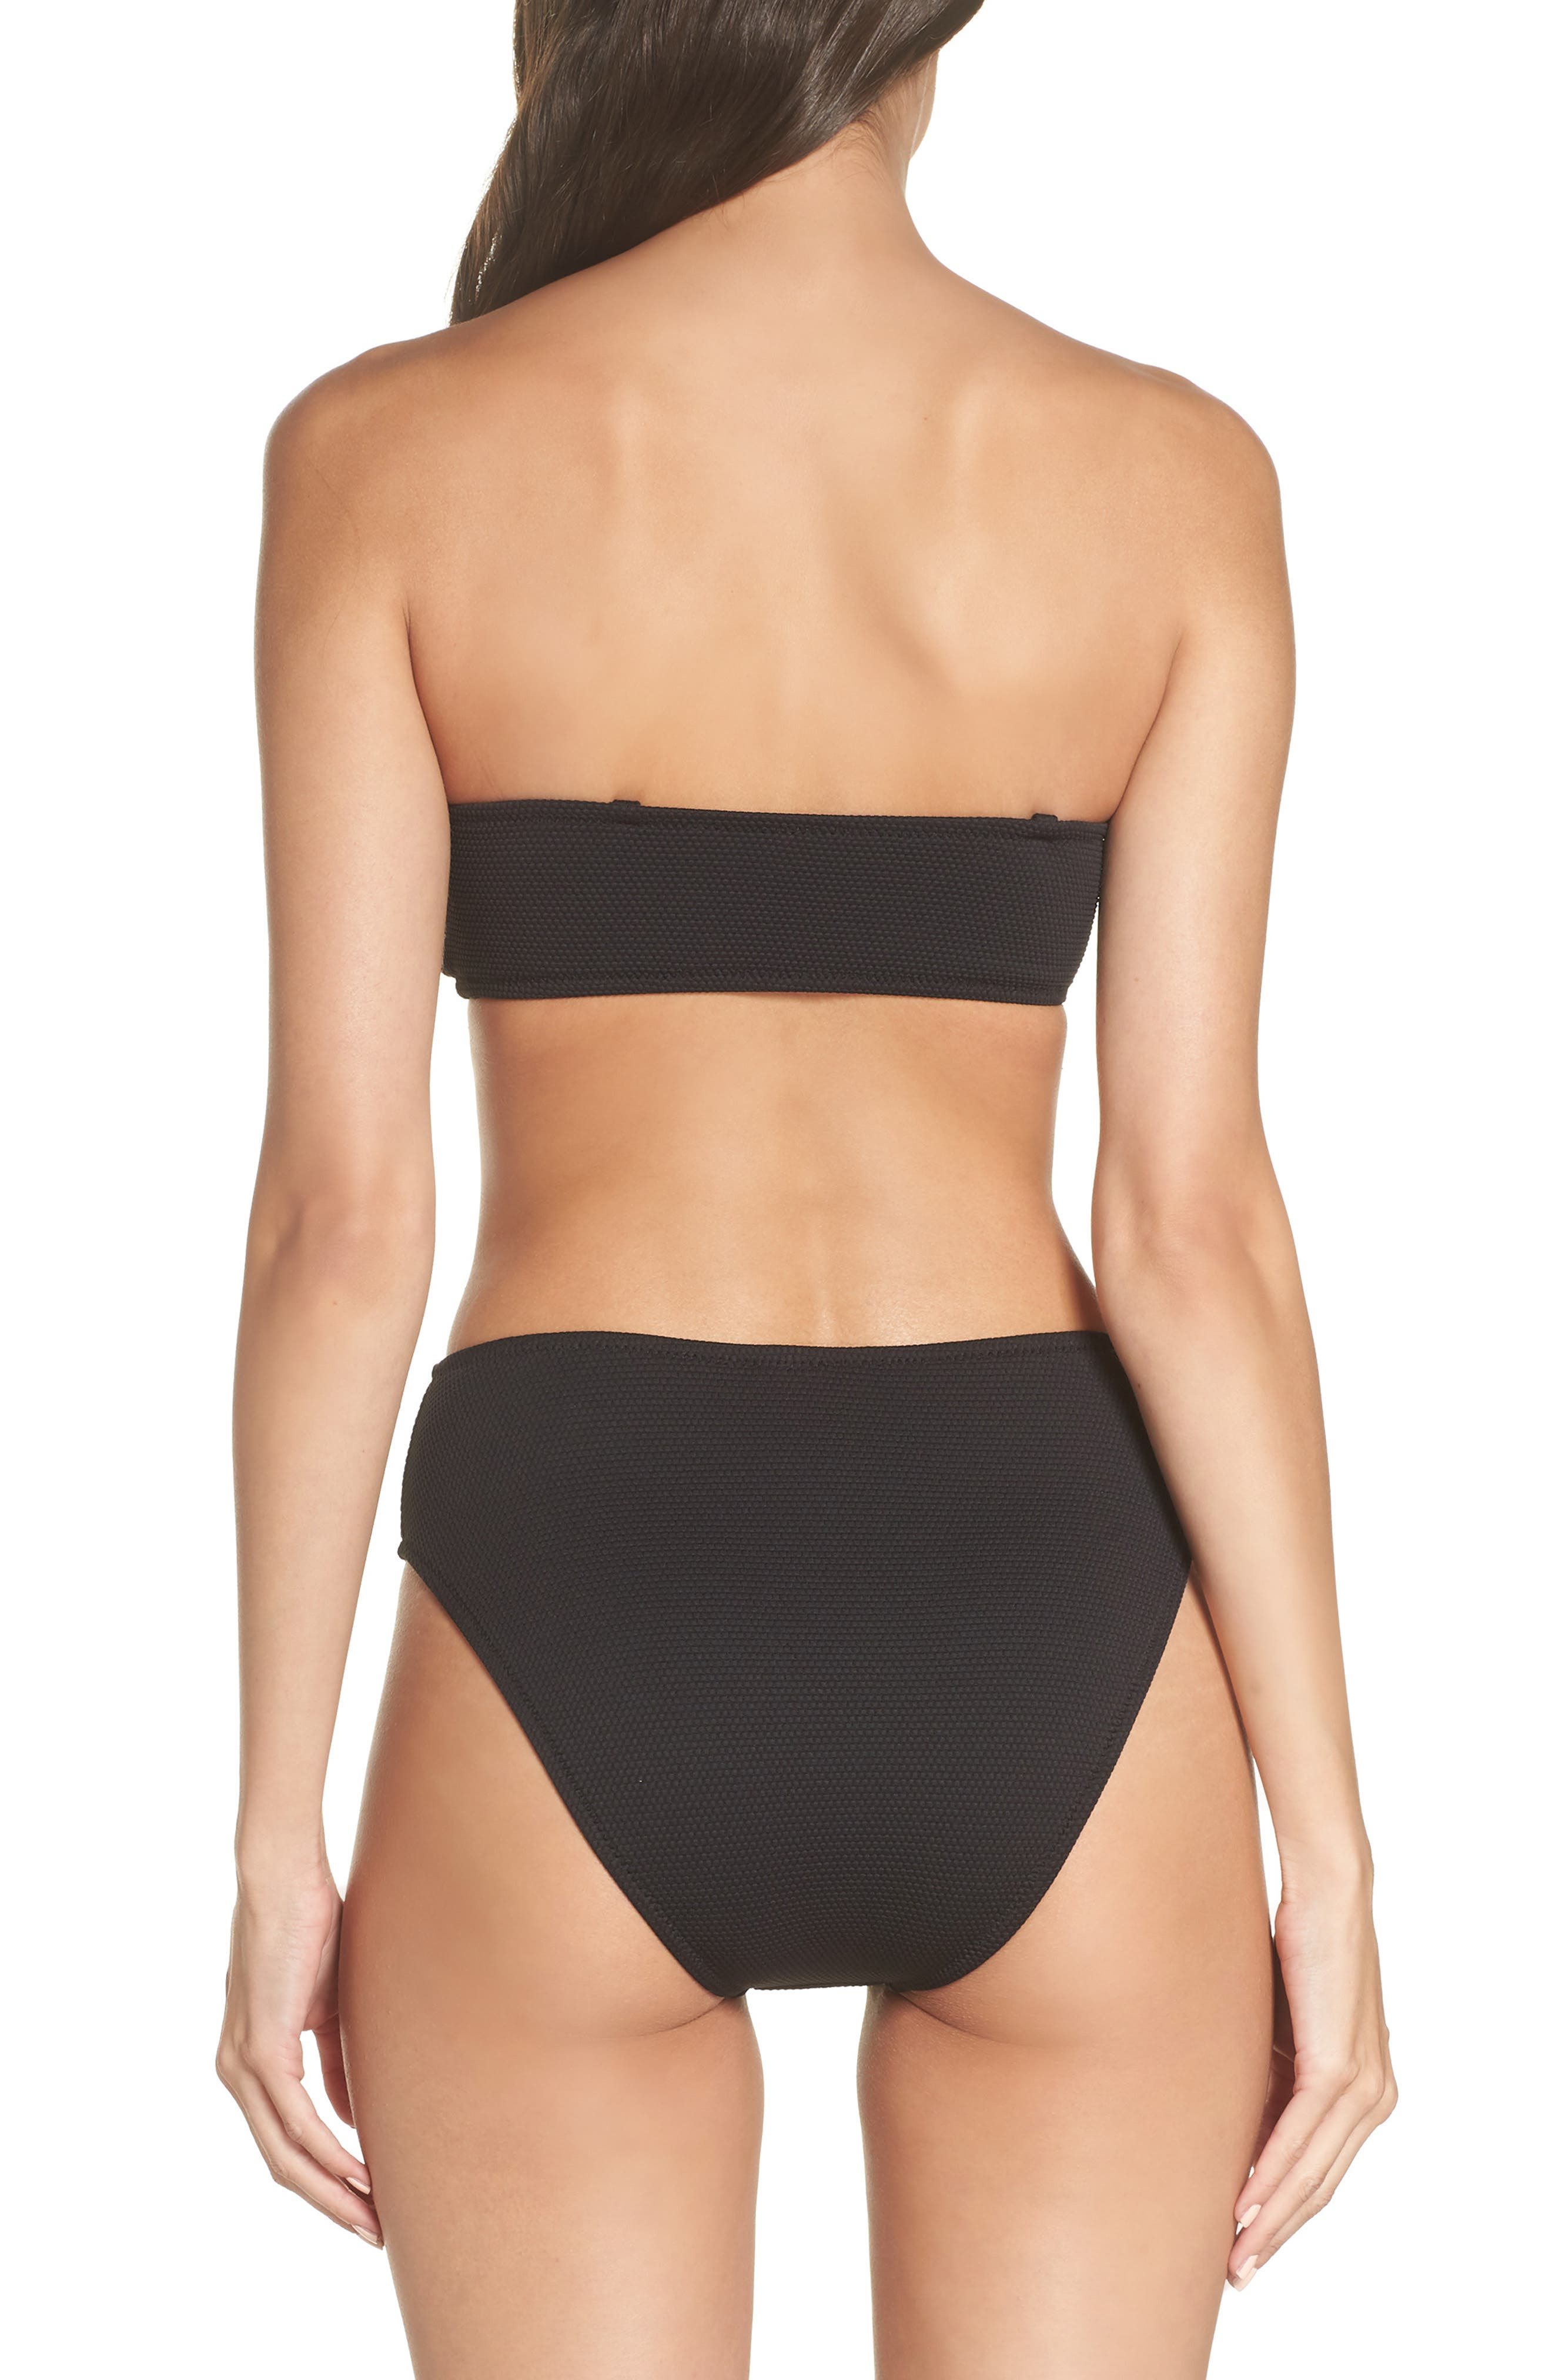 Convertible Bikini Top,                             Alternate thumbnail 9, color,                             BLACK